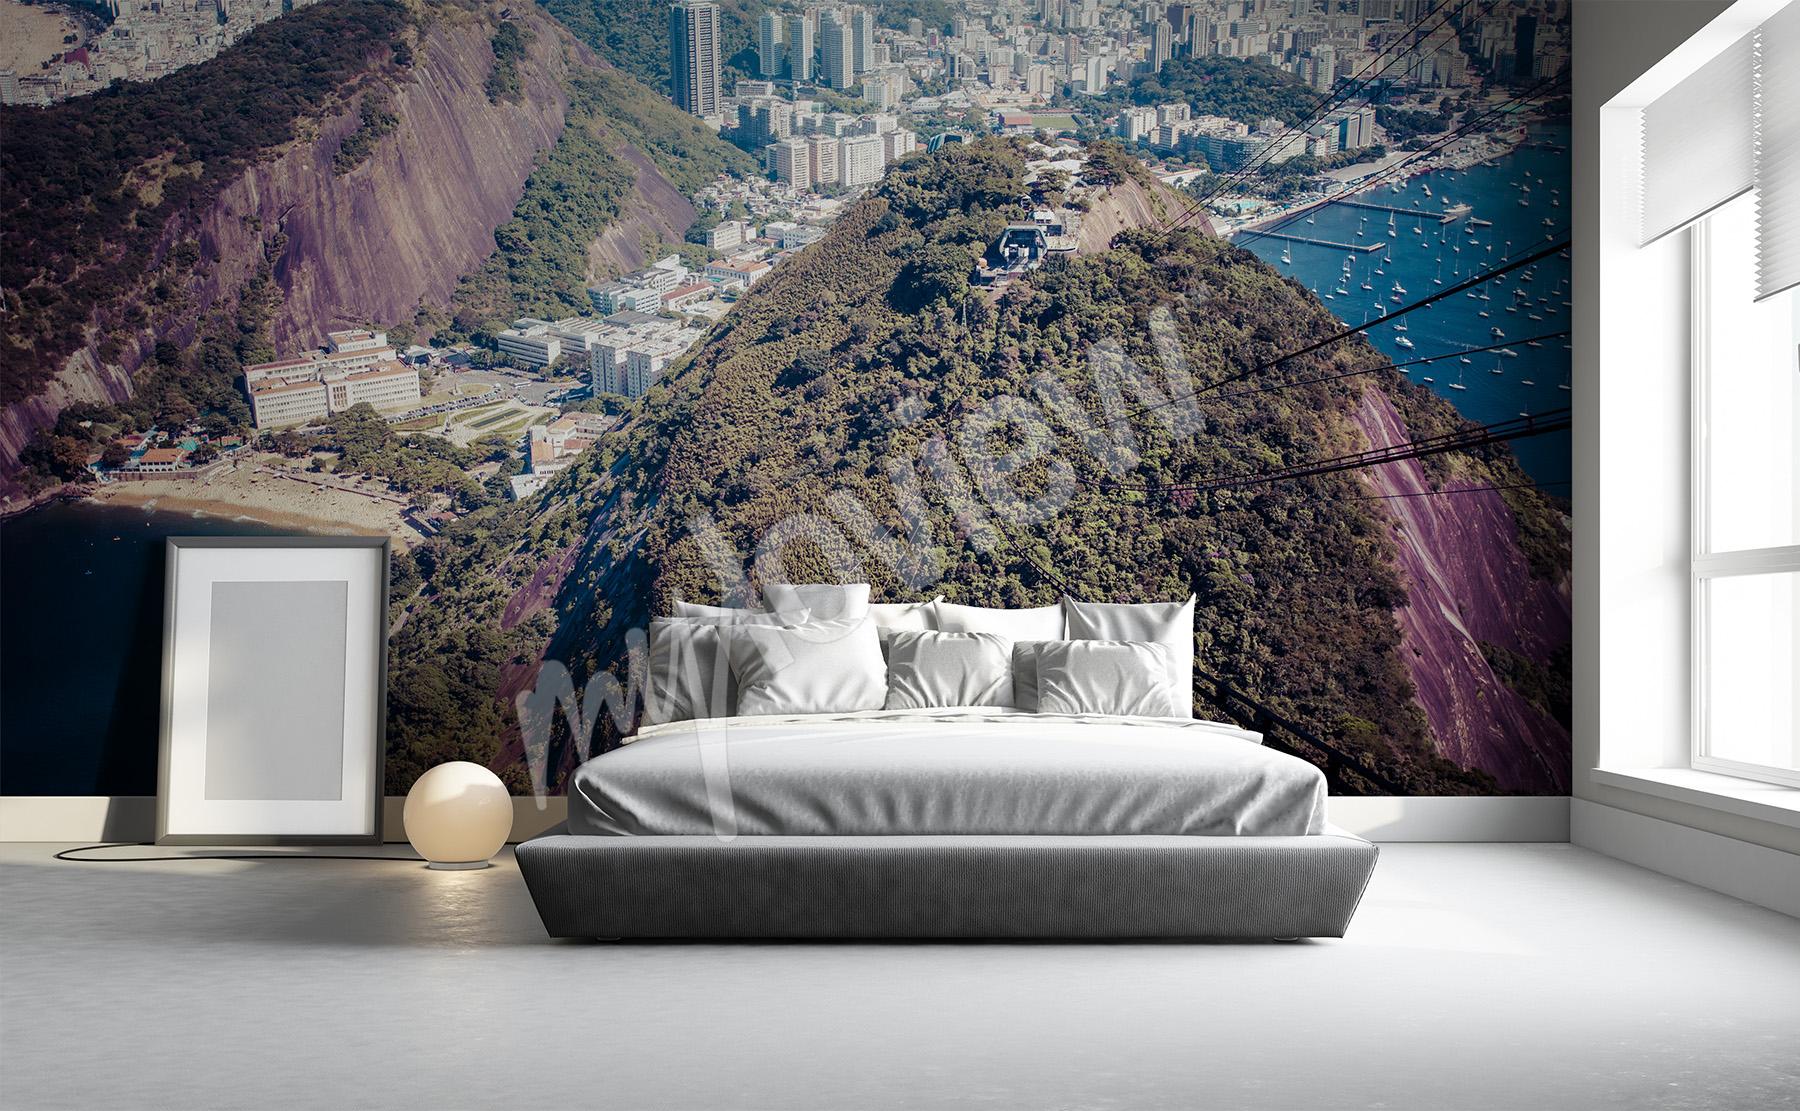 Fototapety g ry cienne na wymiar - Murales camera da letto ...